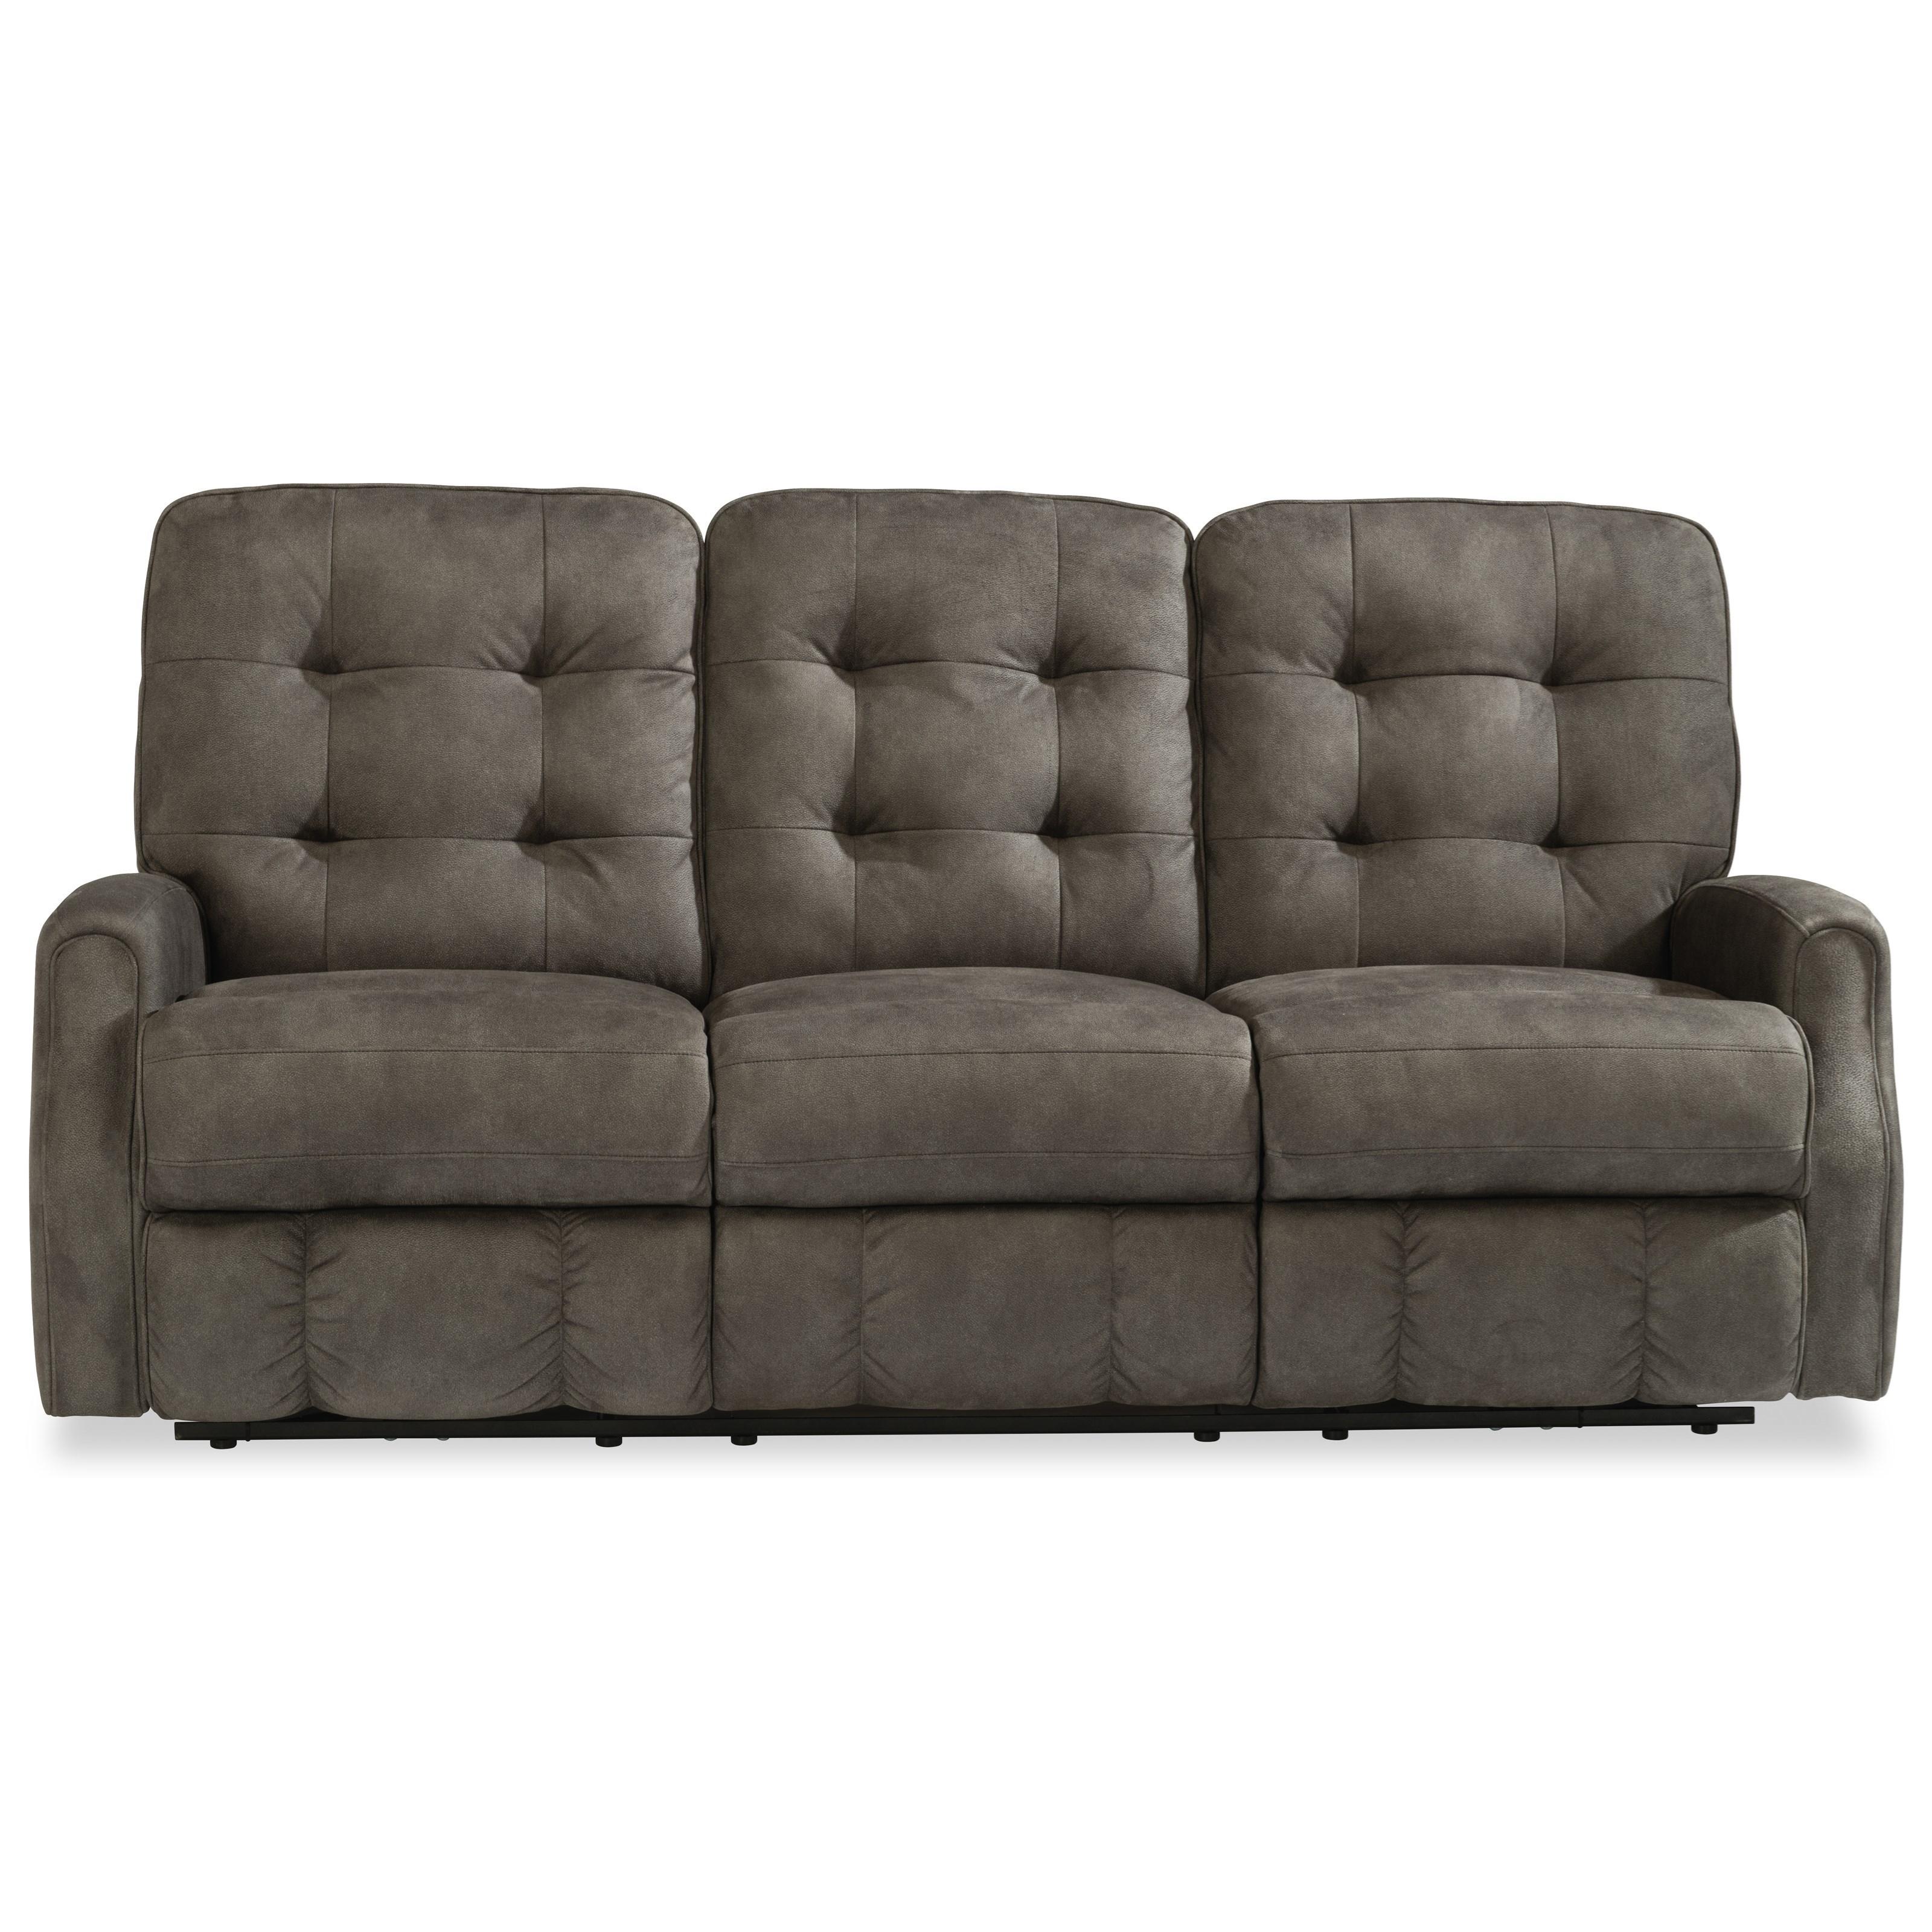 Devon Reclining Sofa  by Flexsteel at Steger's Furniture